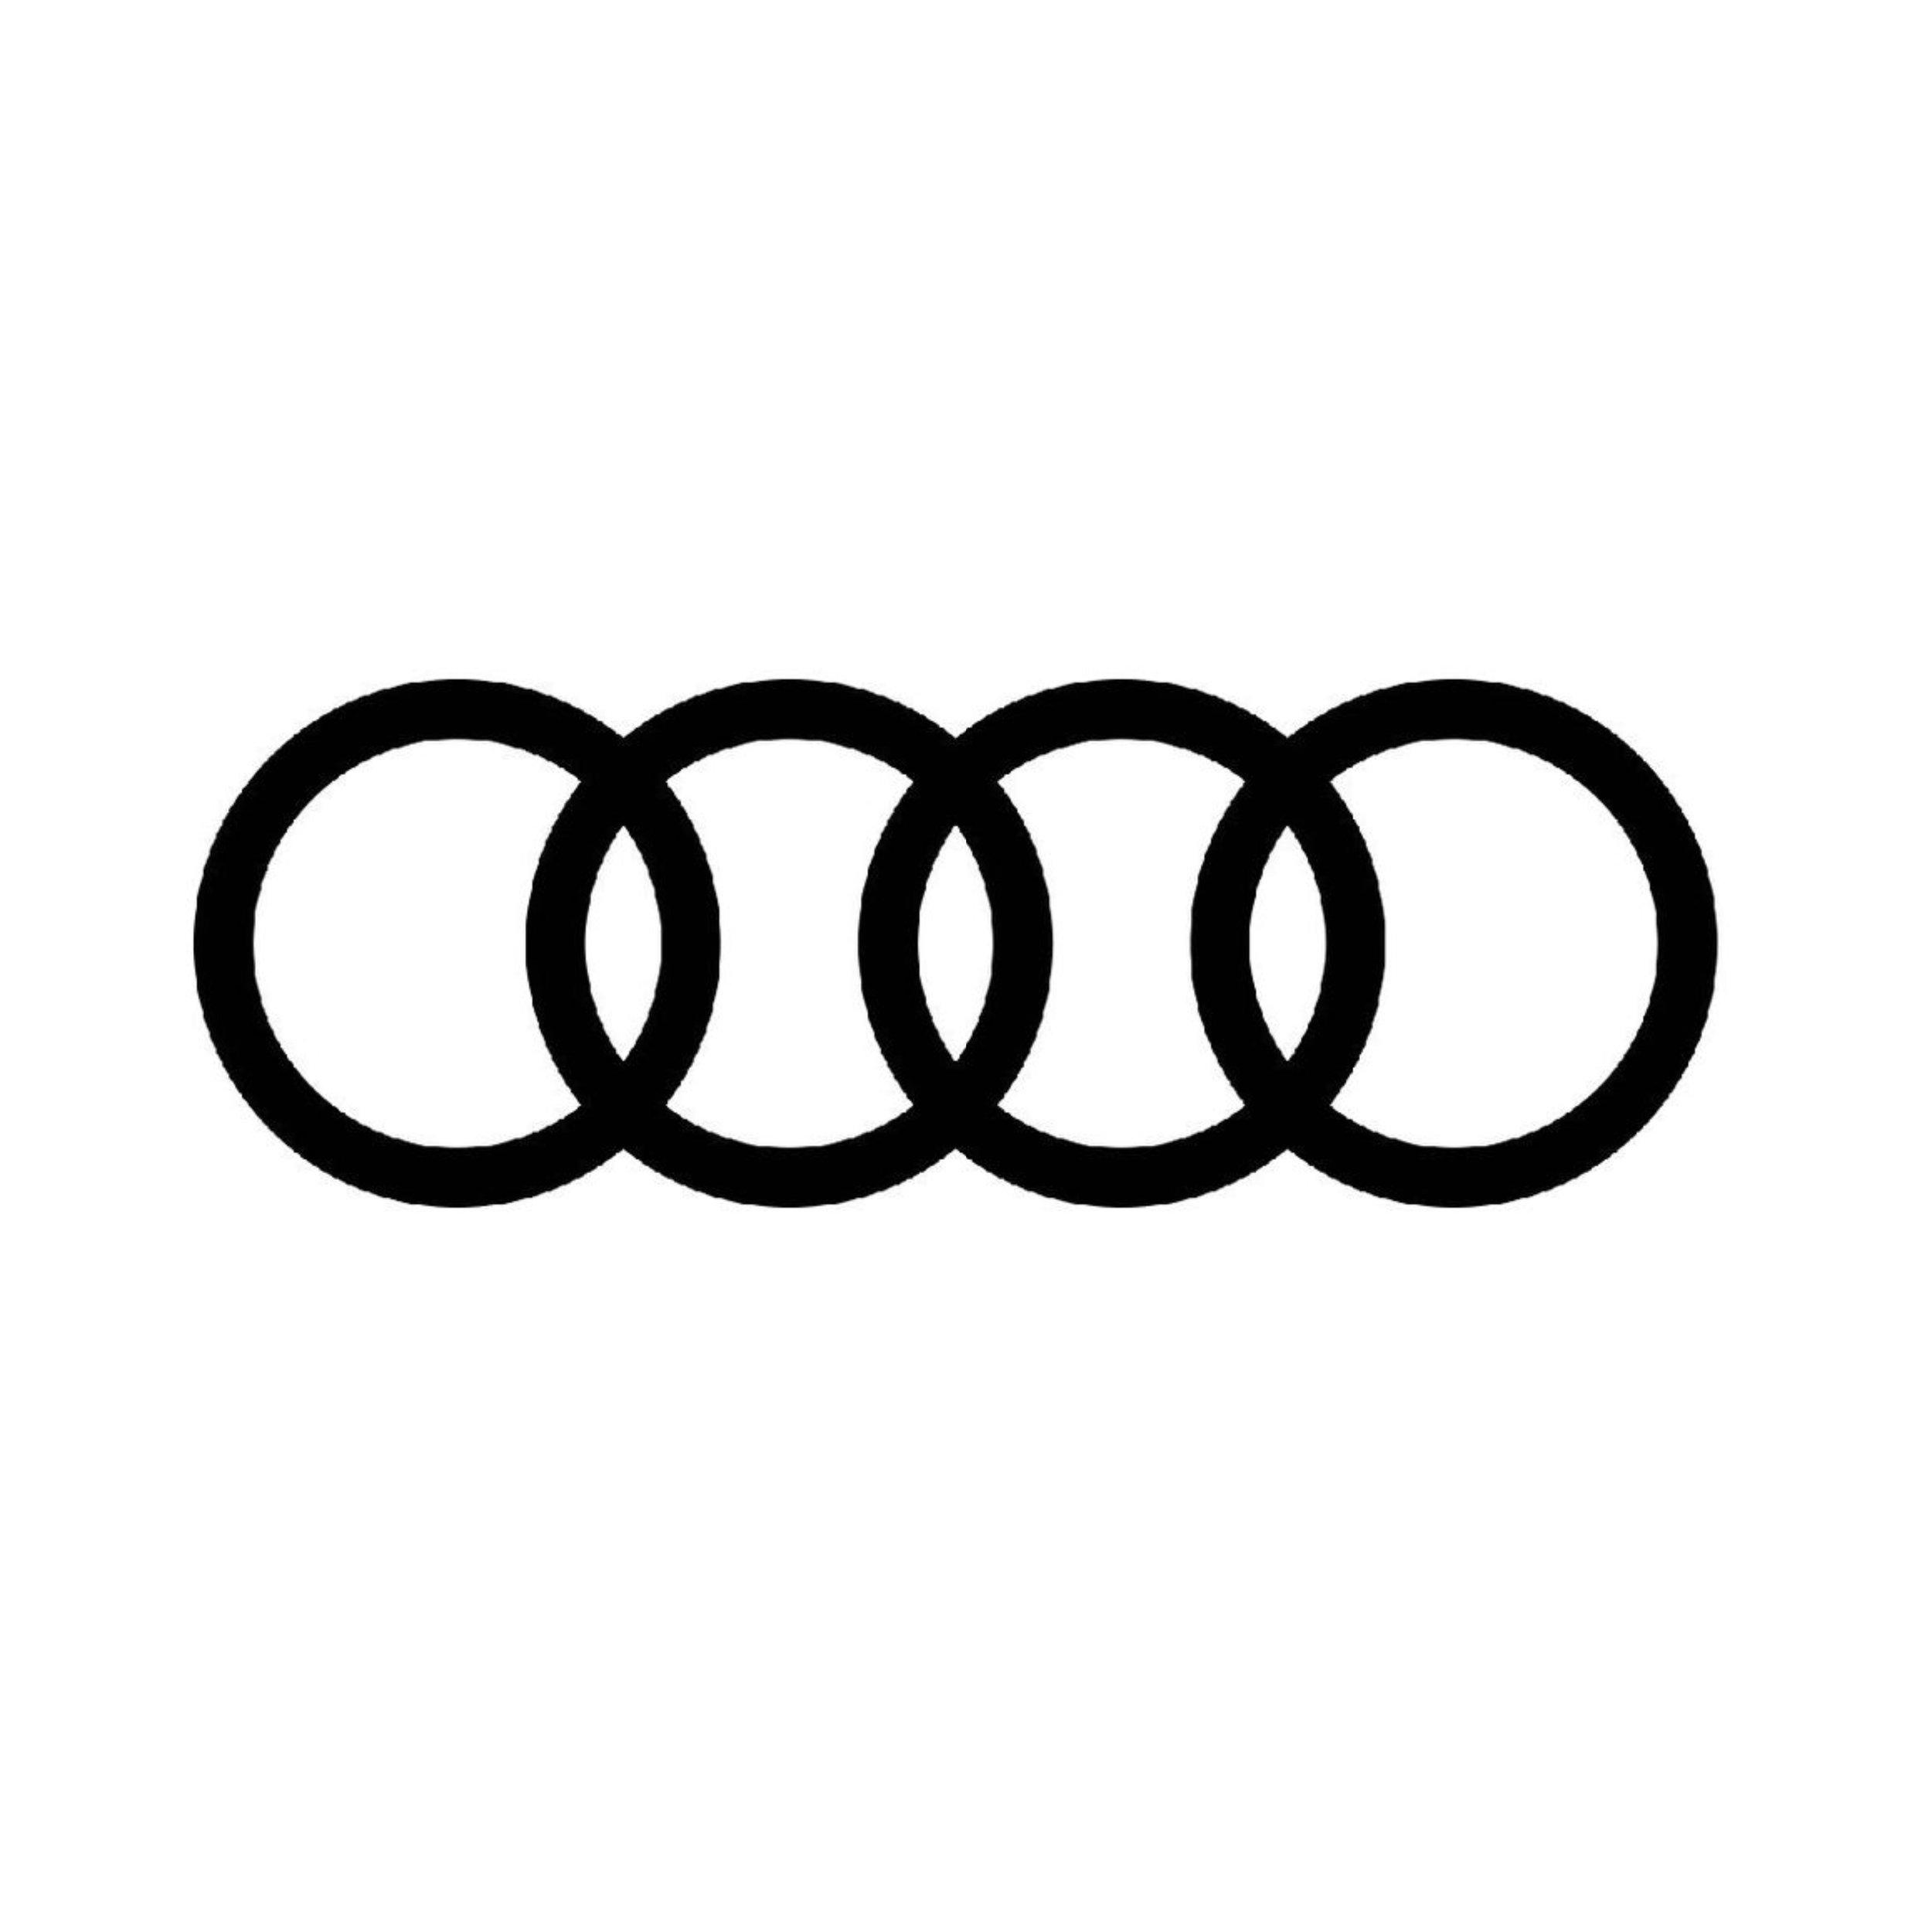 Audi - Anzahl Angebote: 5